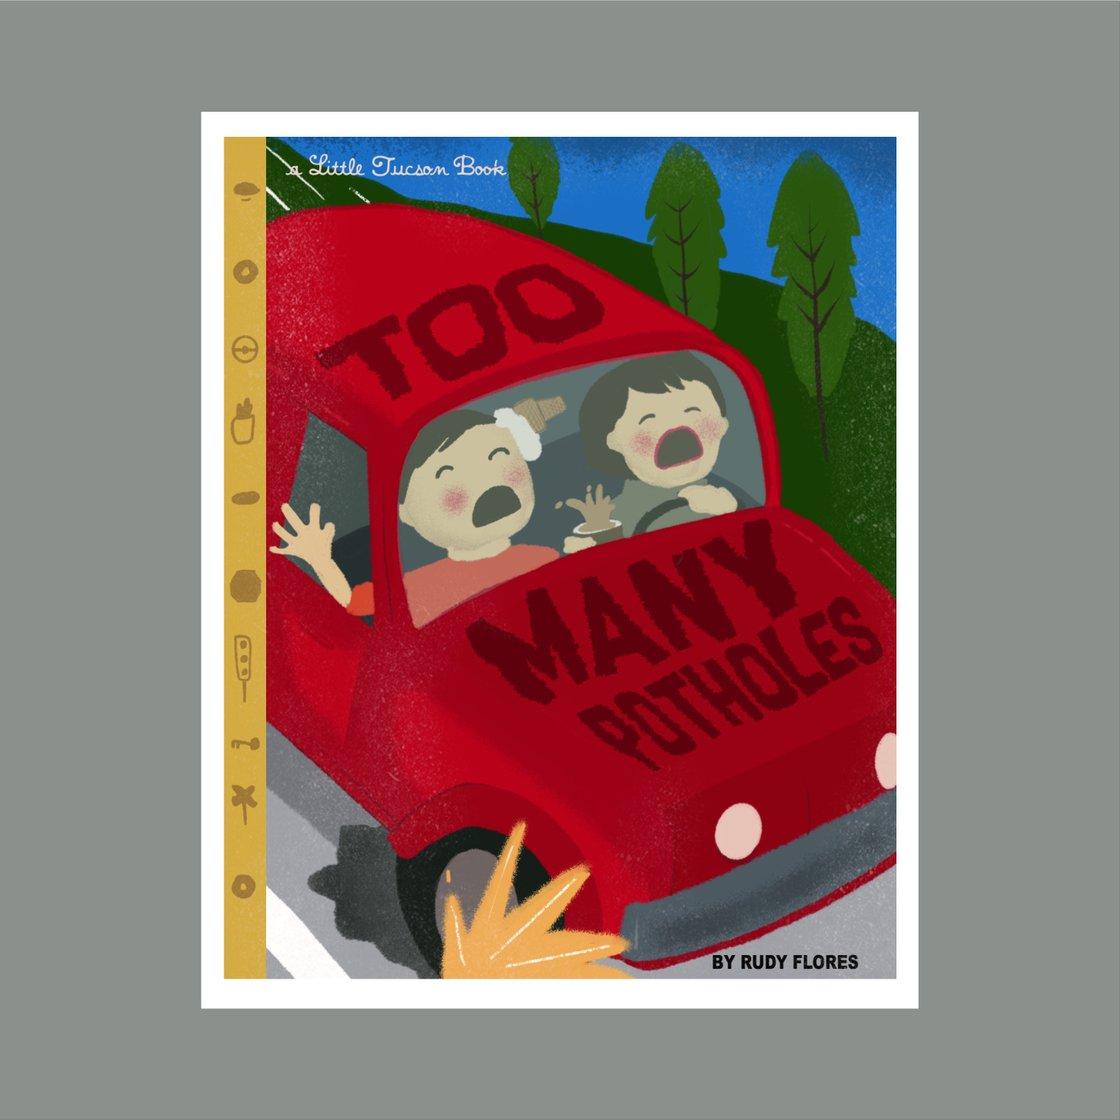 Image of Too Many Potholes